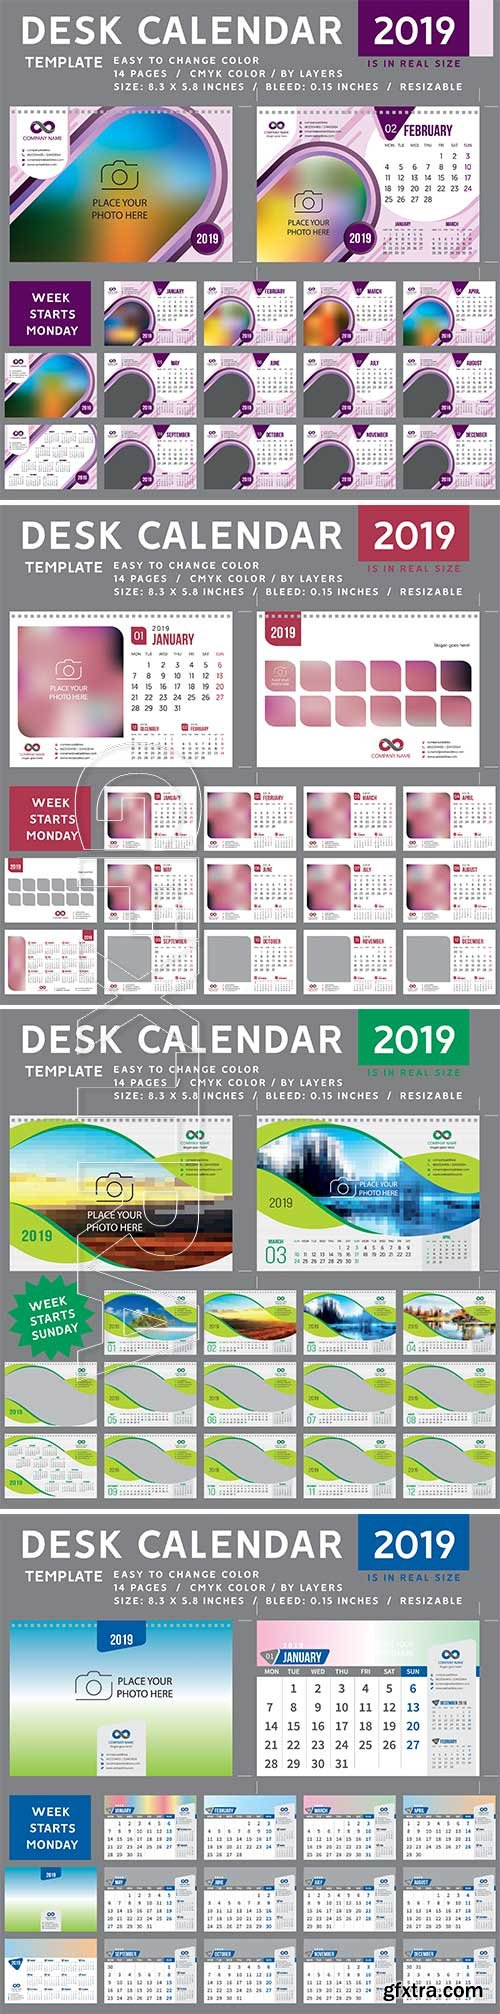 Desk Calendar 2019 vector template, 12 months included # 2